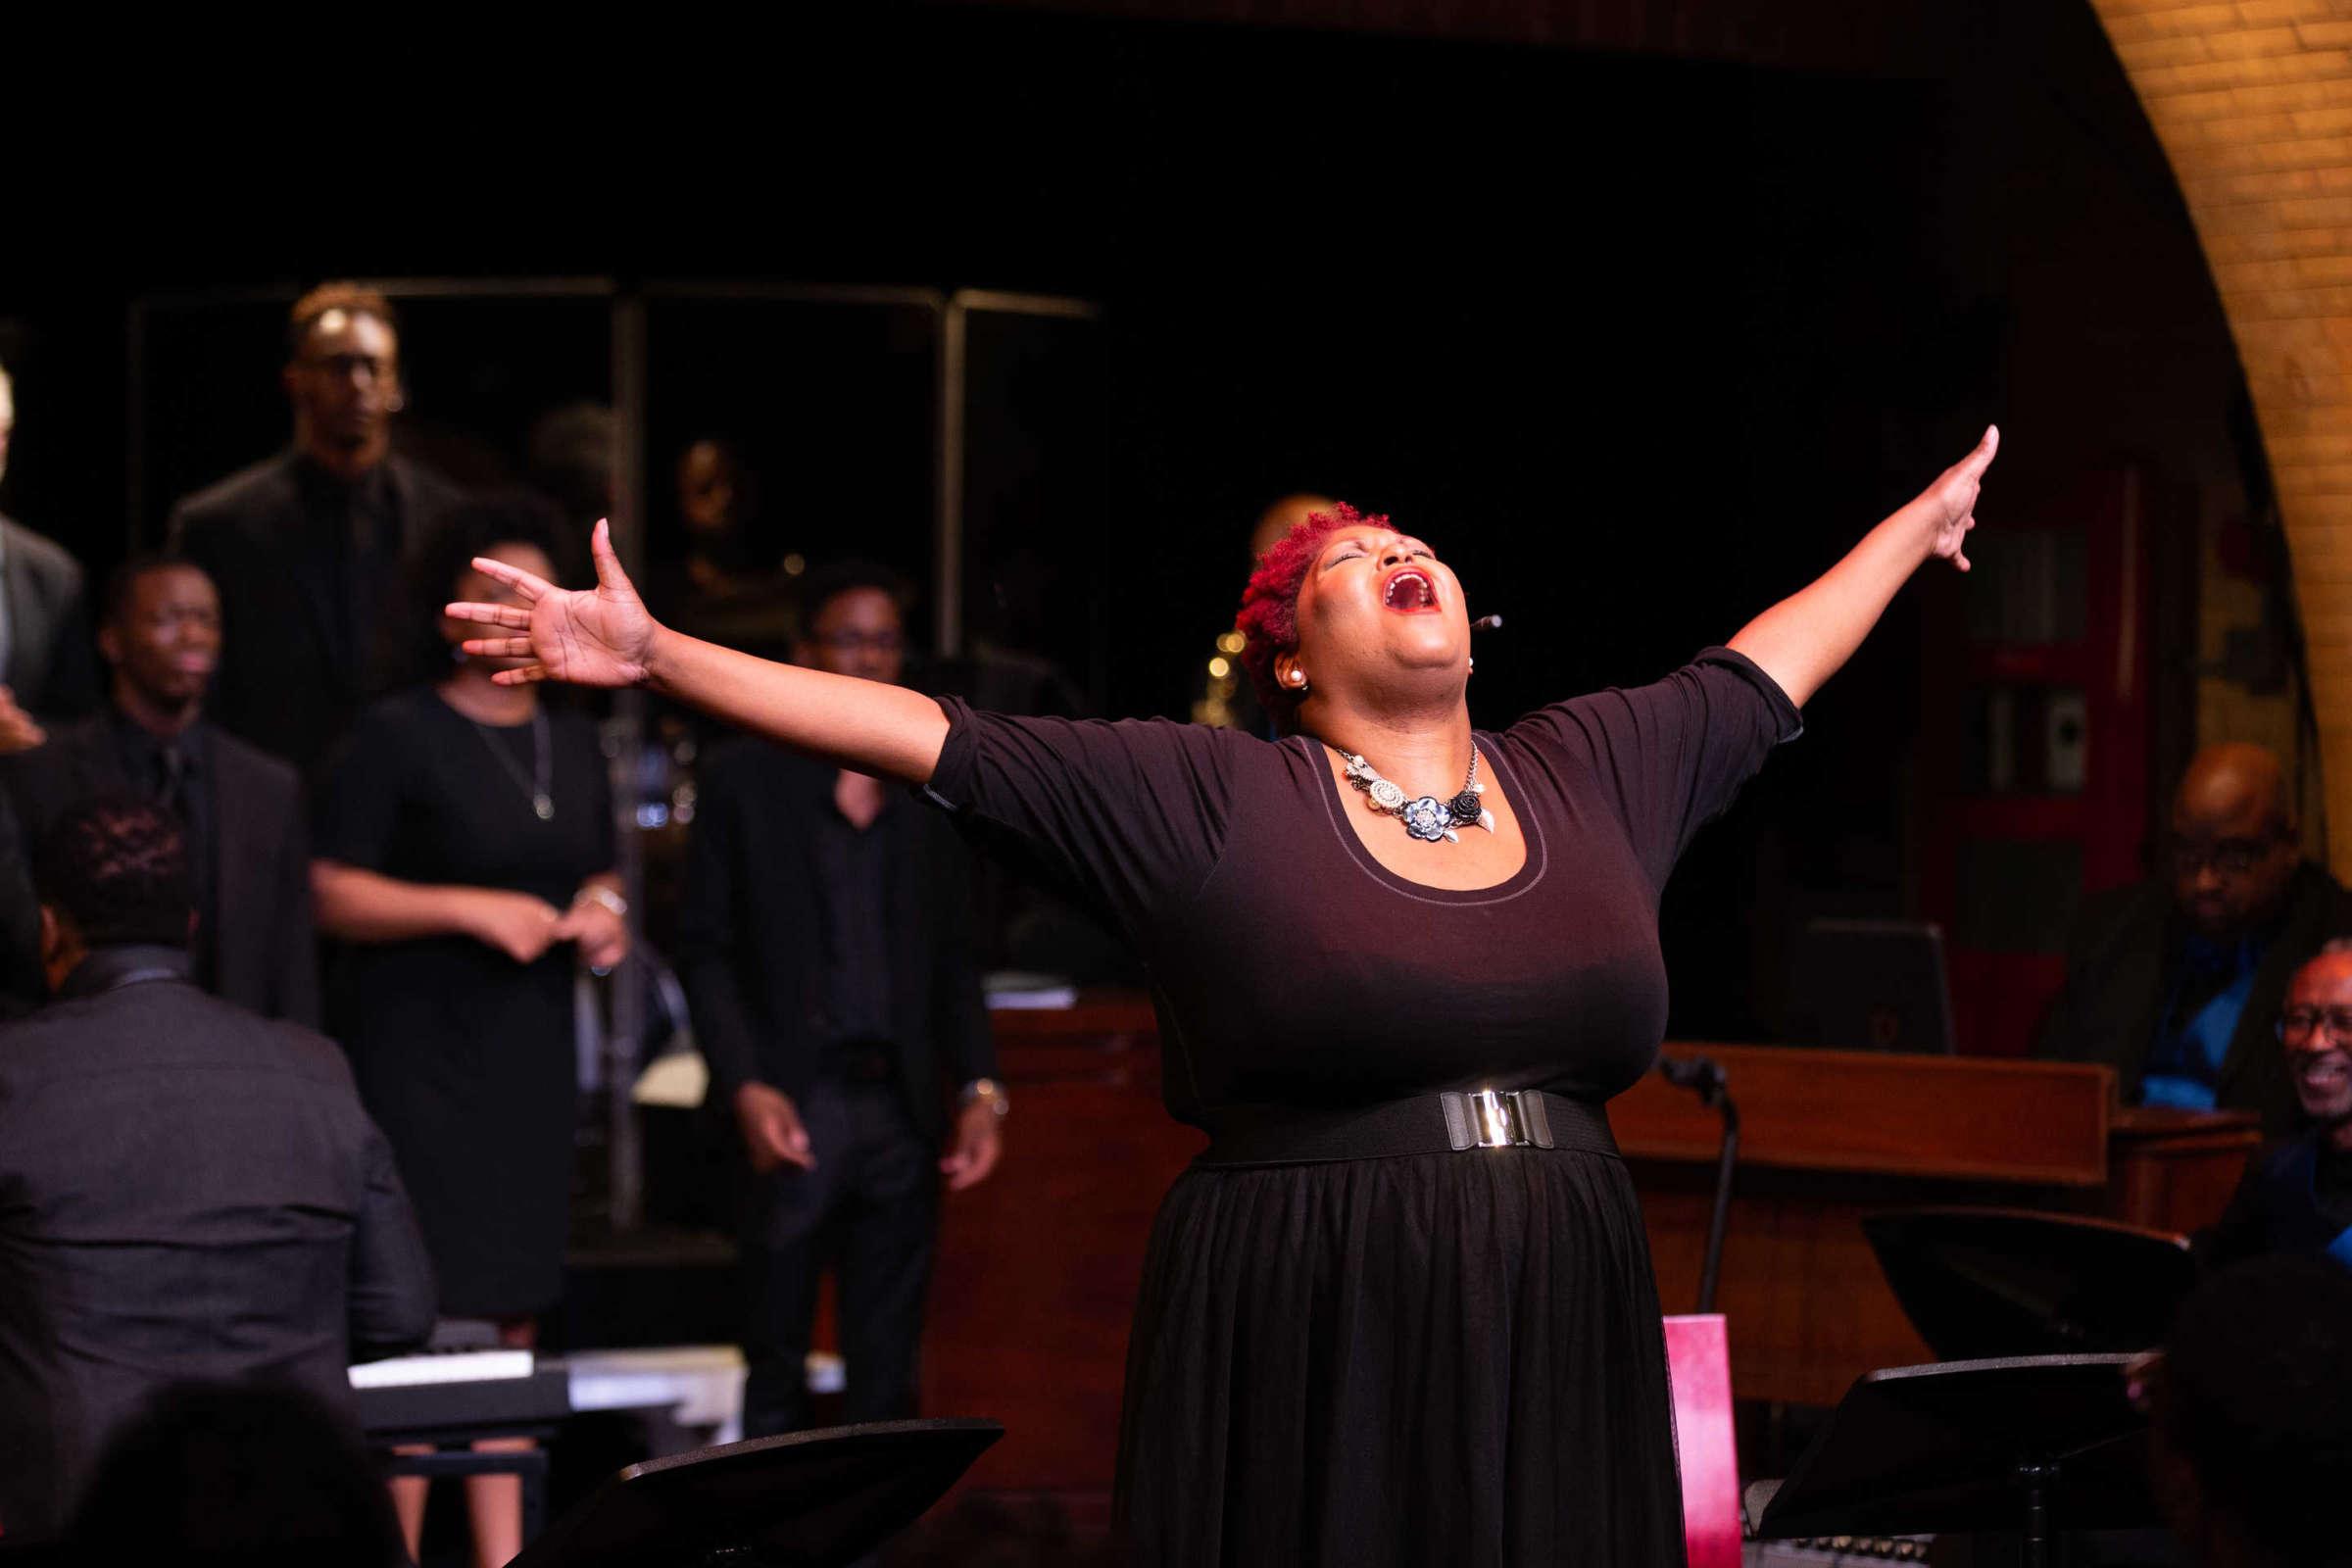 Chris Noth - Antigone in Ferguson at Harlem Stage - Theater of War